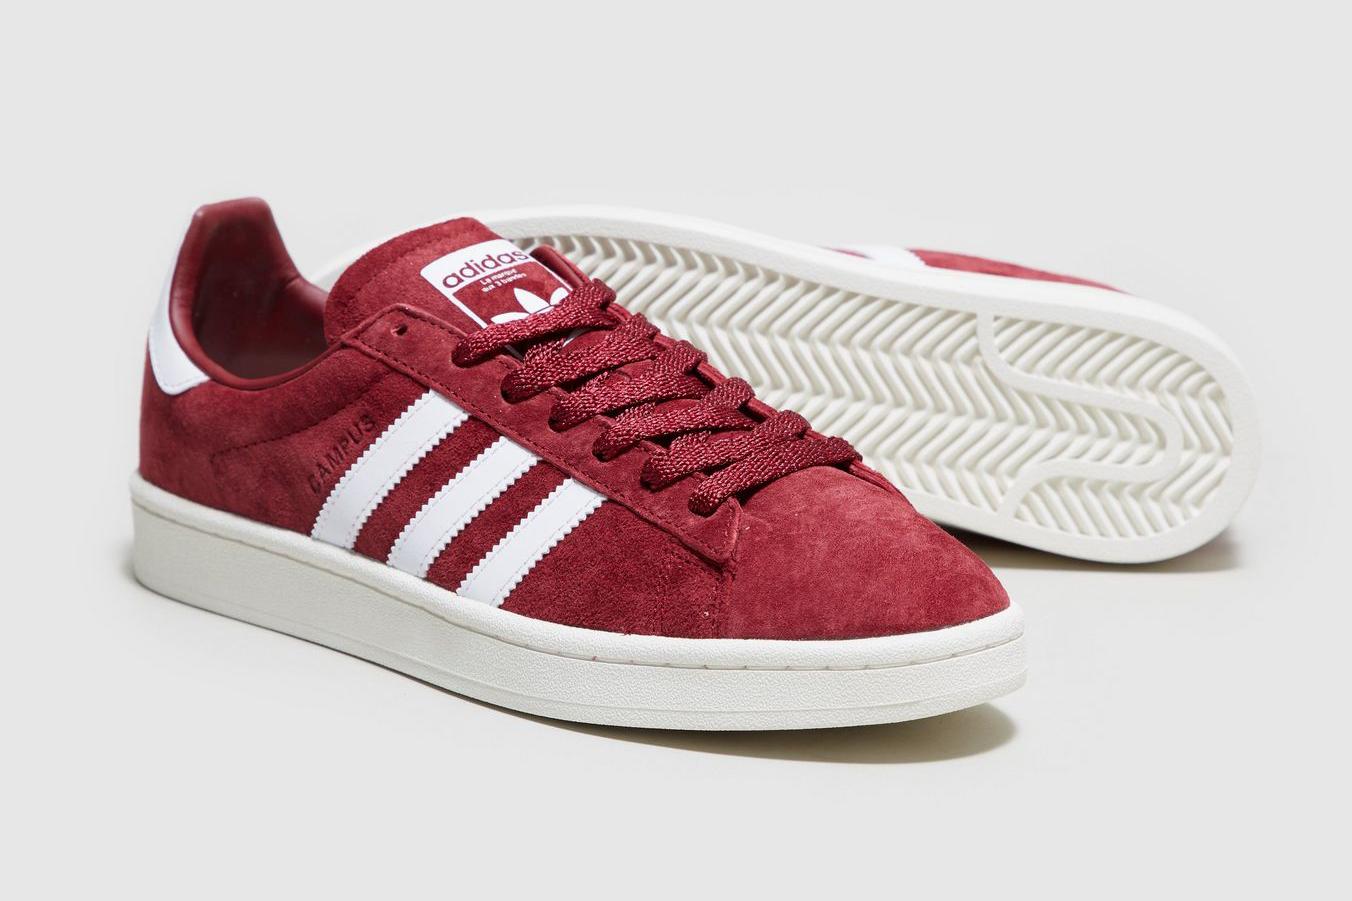 Originals Size geschiedenis Adidas Campus blog korte Een tOqSn